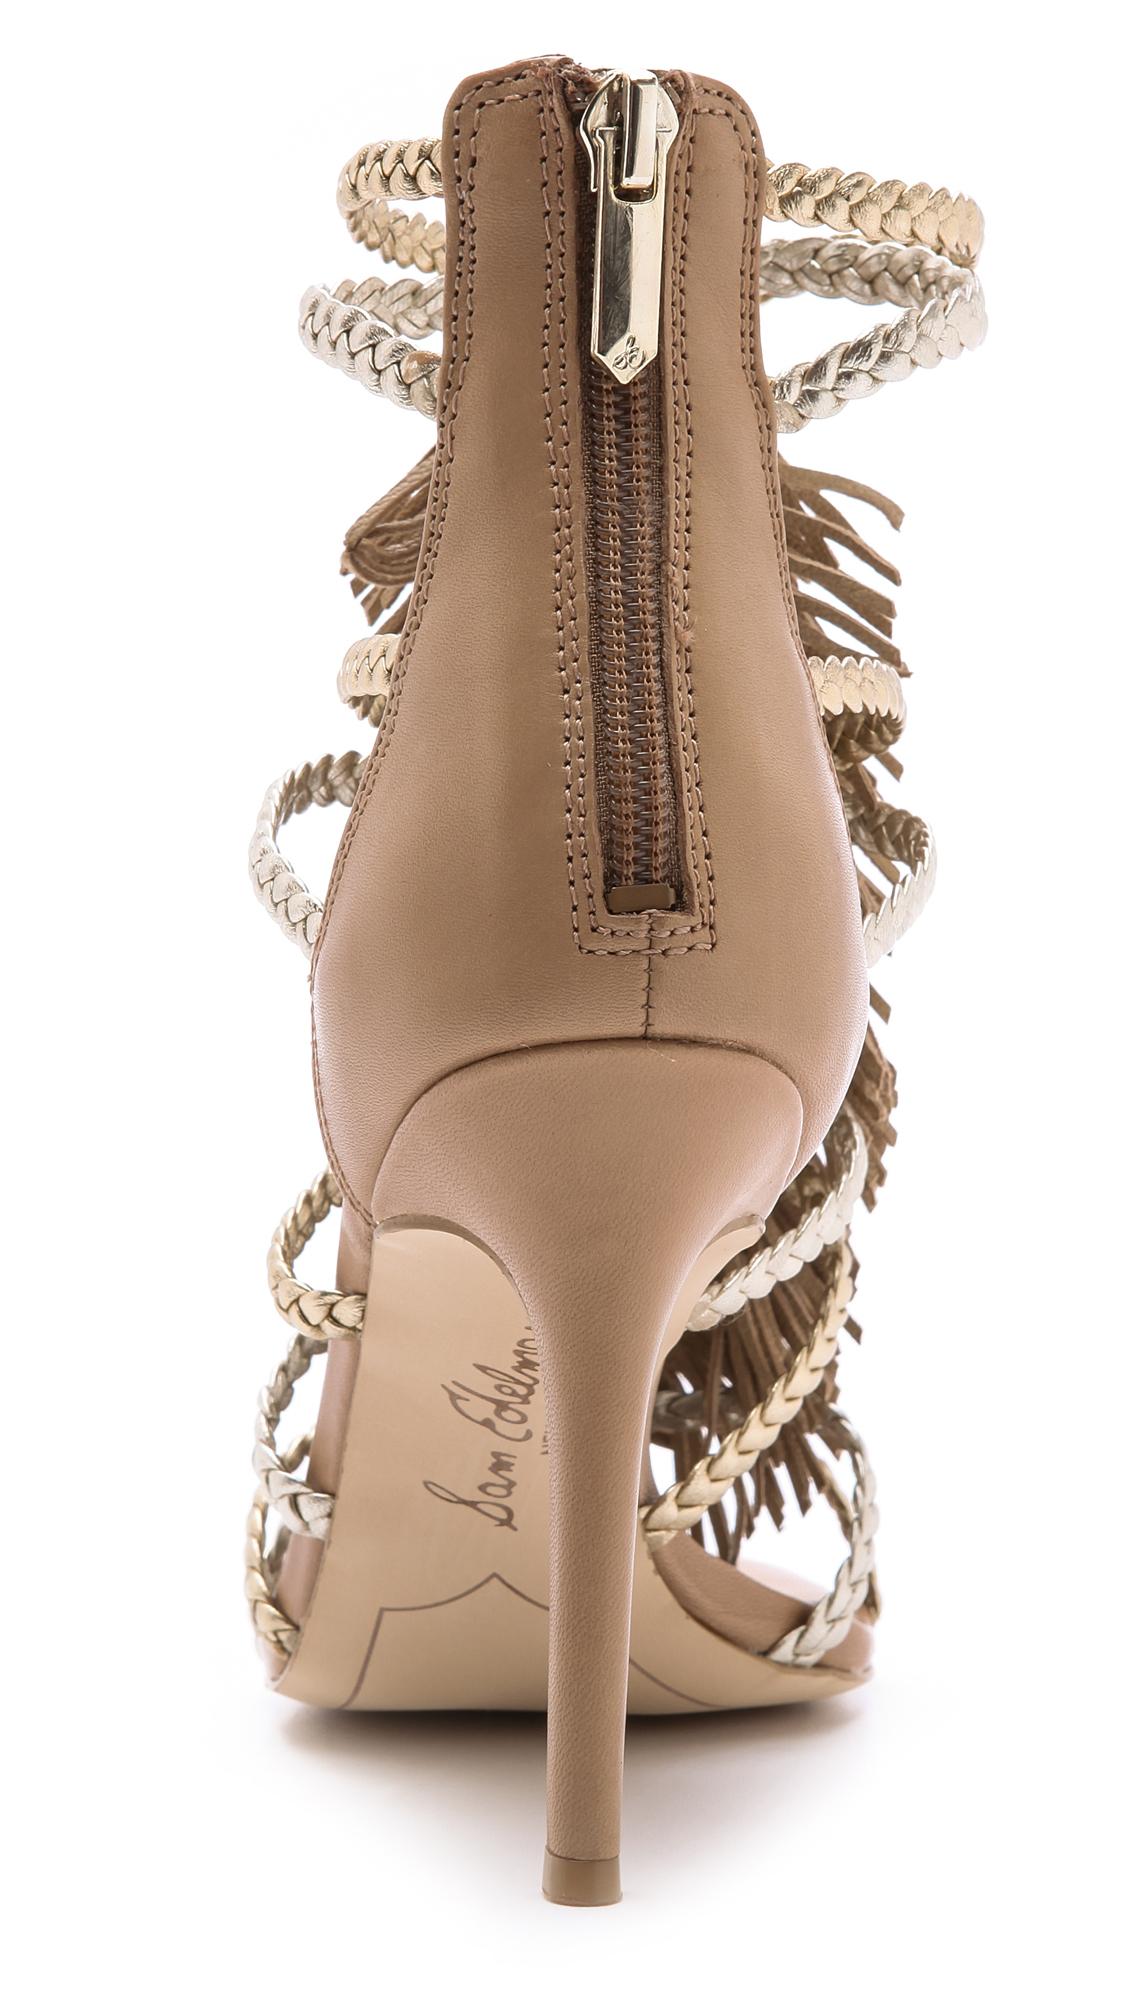 df7ccd98013c Lyst - Sam Edelman Savannah Fringe Gladiator Heels - Nude Gold in ...